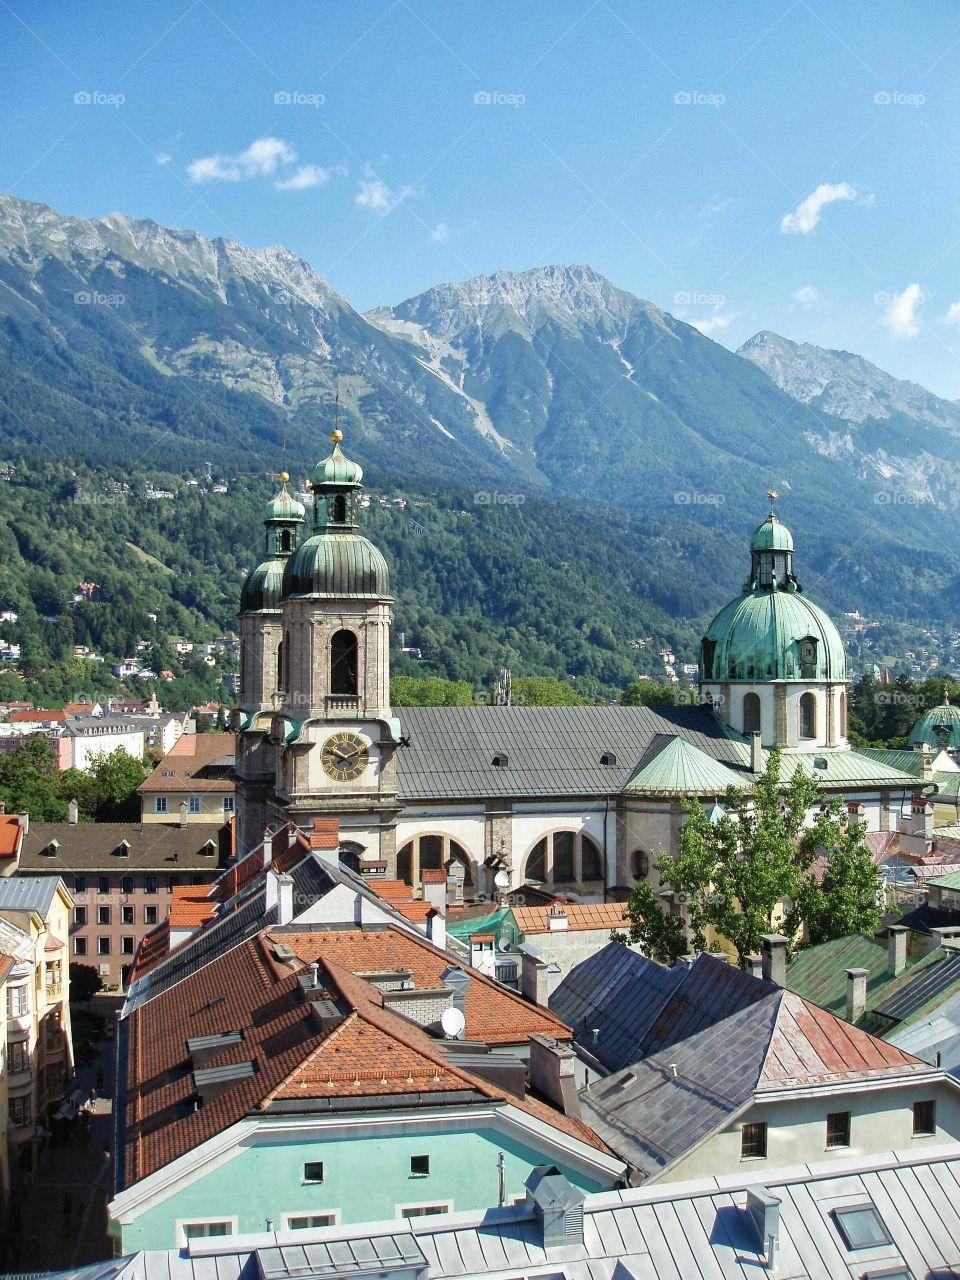 Innsbruck in Austria